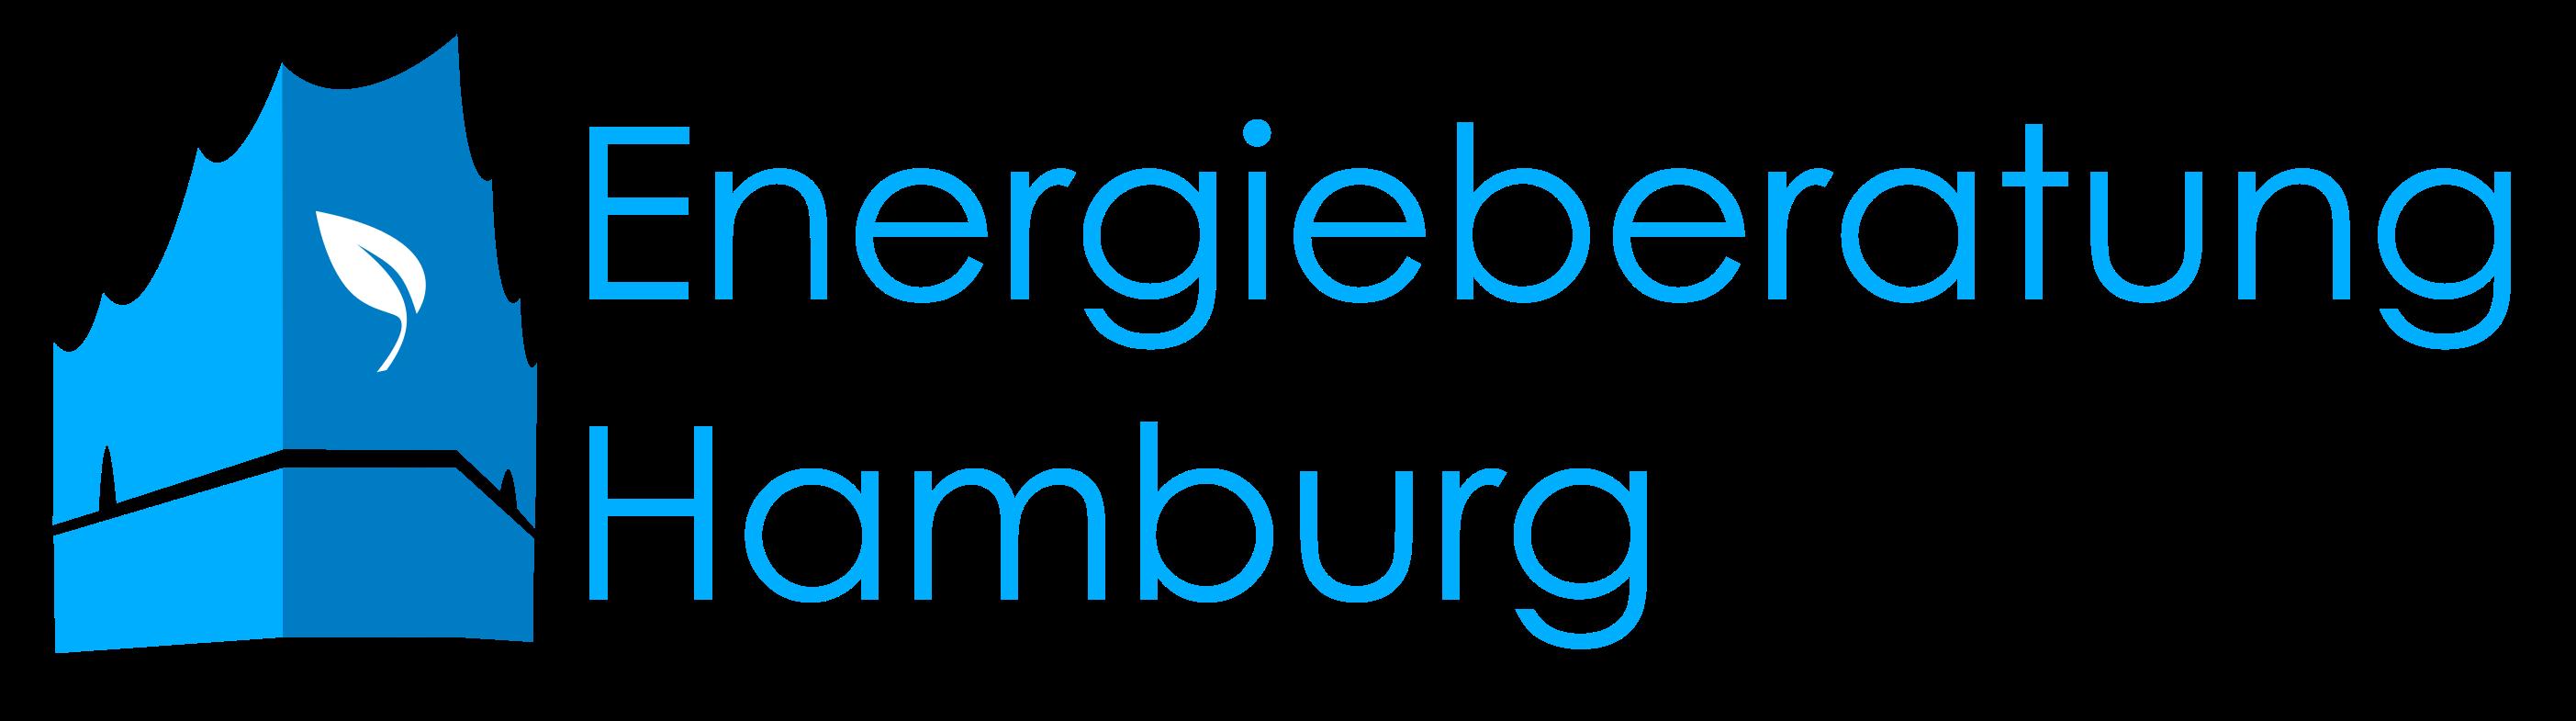 Energieberatung Hamburg